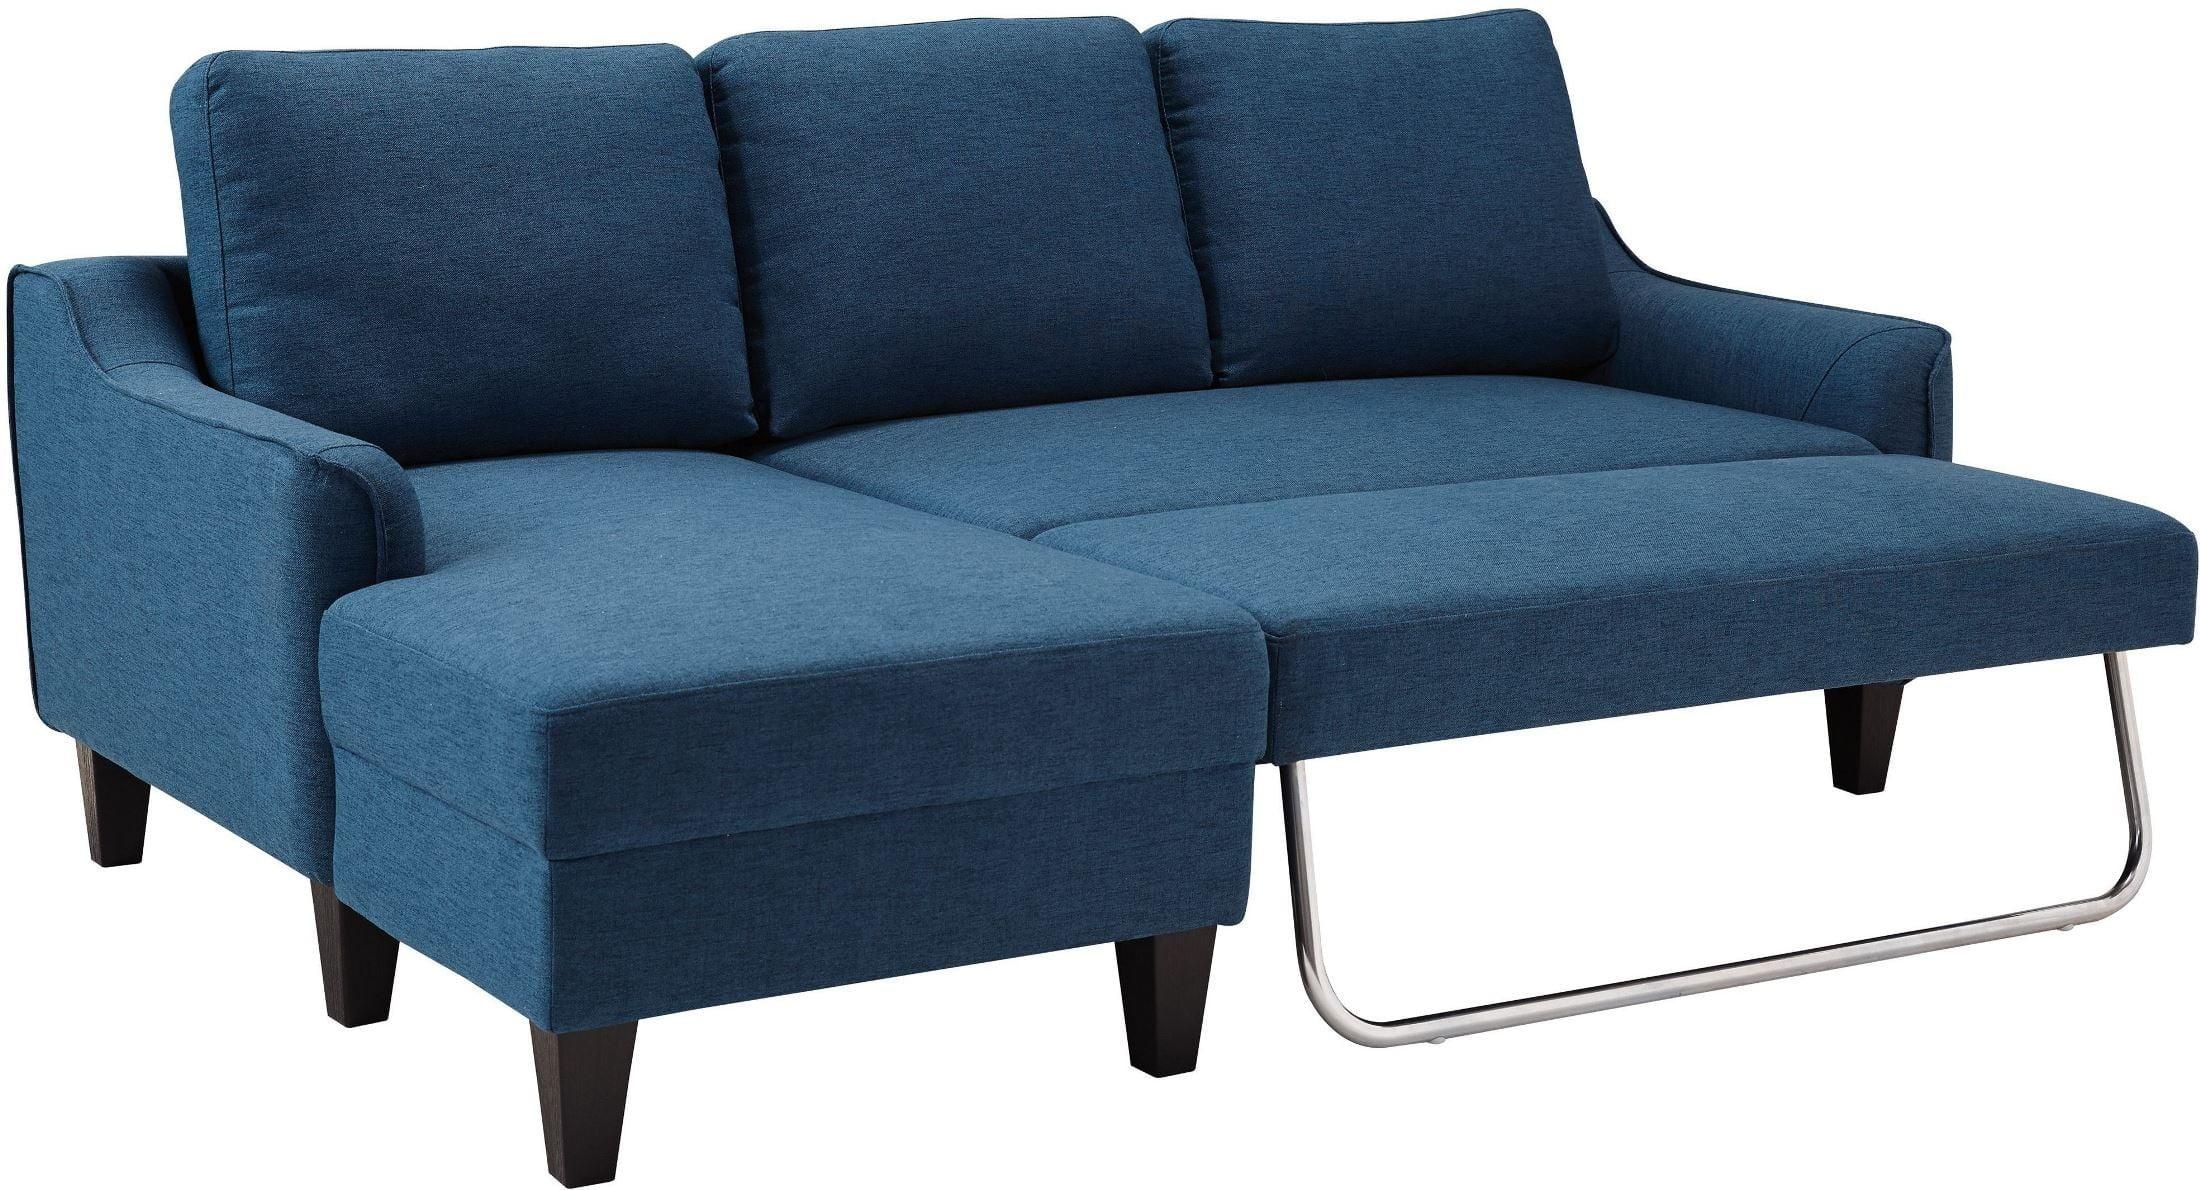 Floor Sample Mille Sofa Sleeper Blue Signature Design By Ashley Furniture